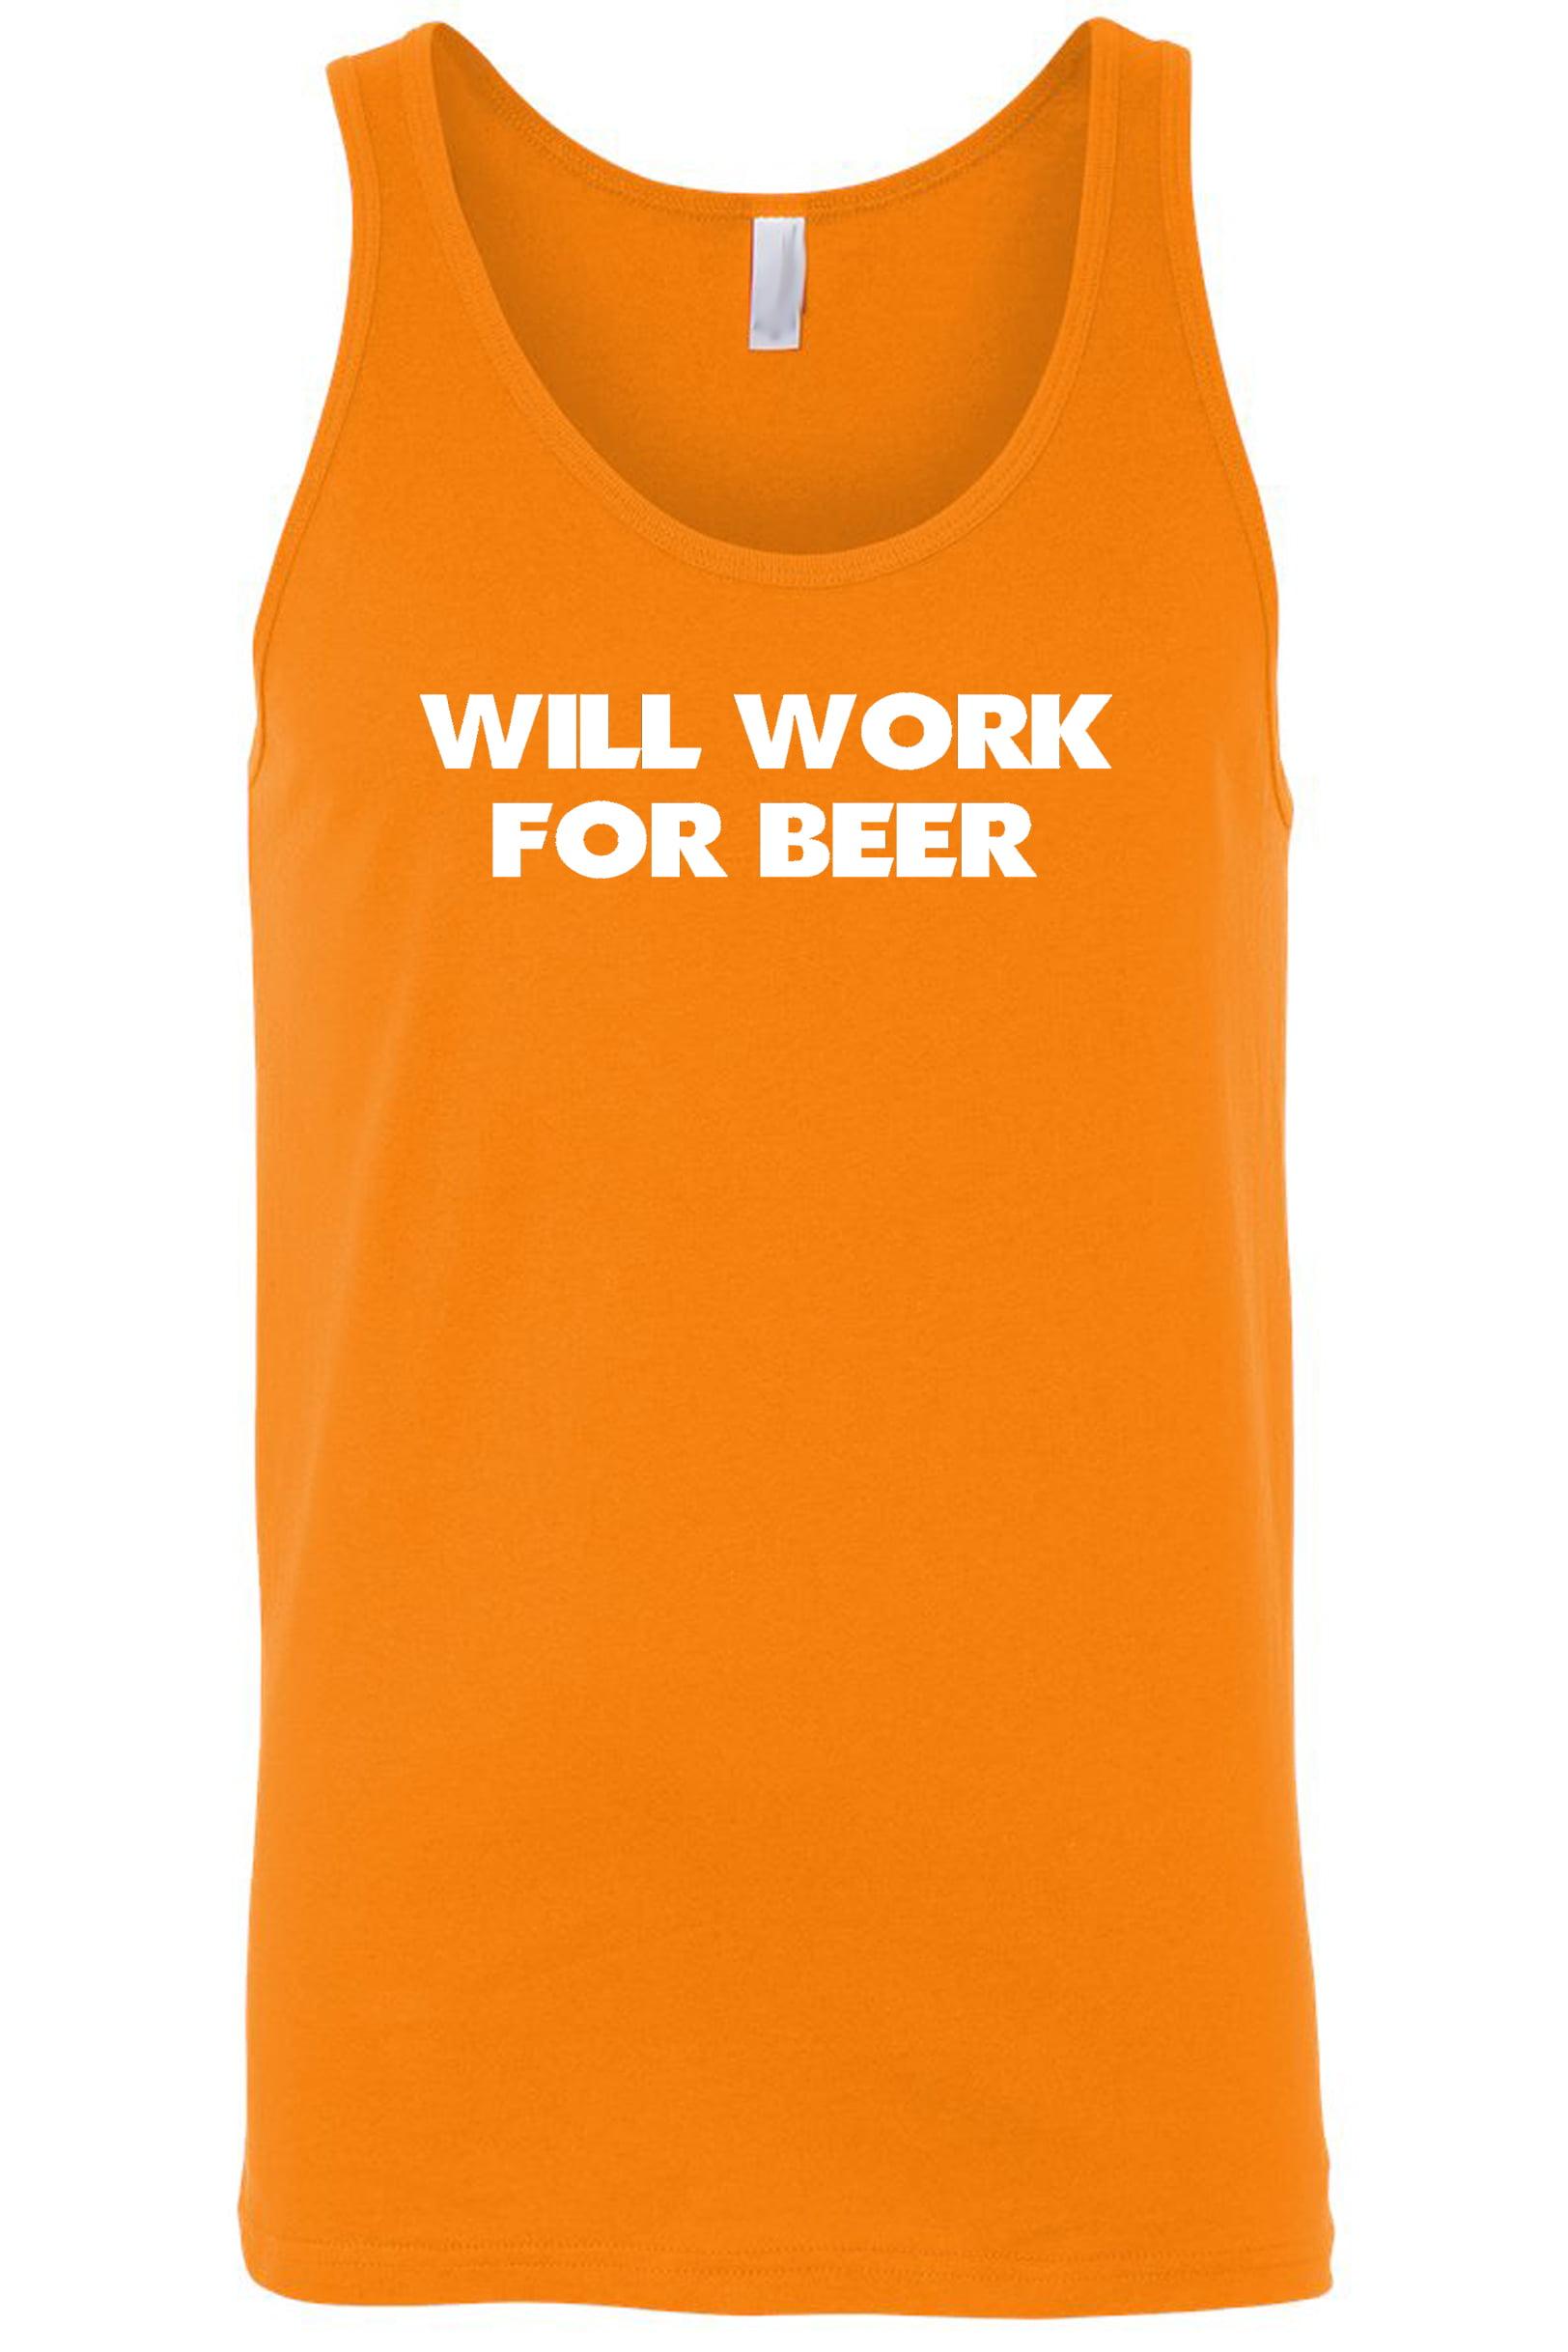 Men's Will Work For Beer Tank Top Shirt